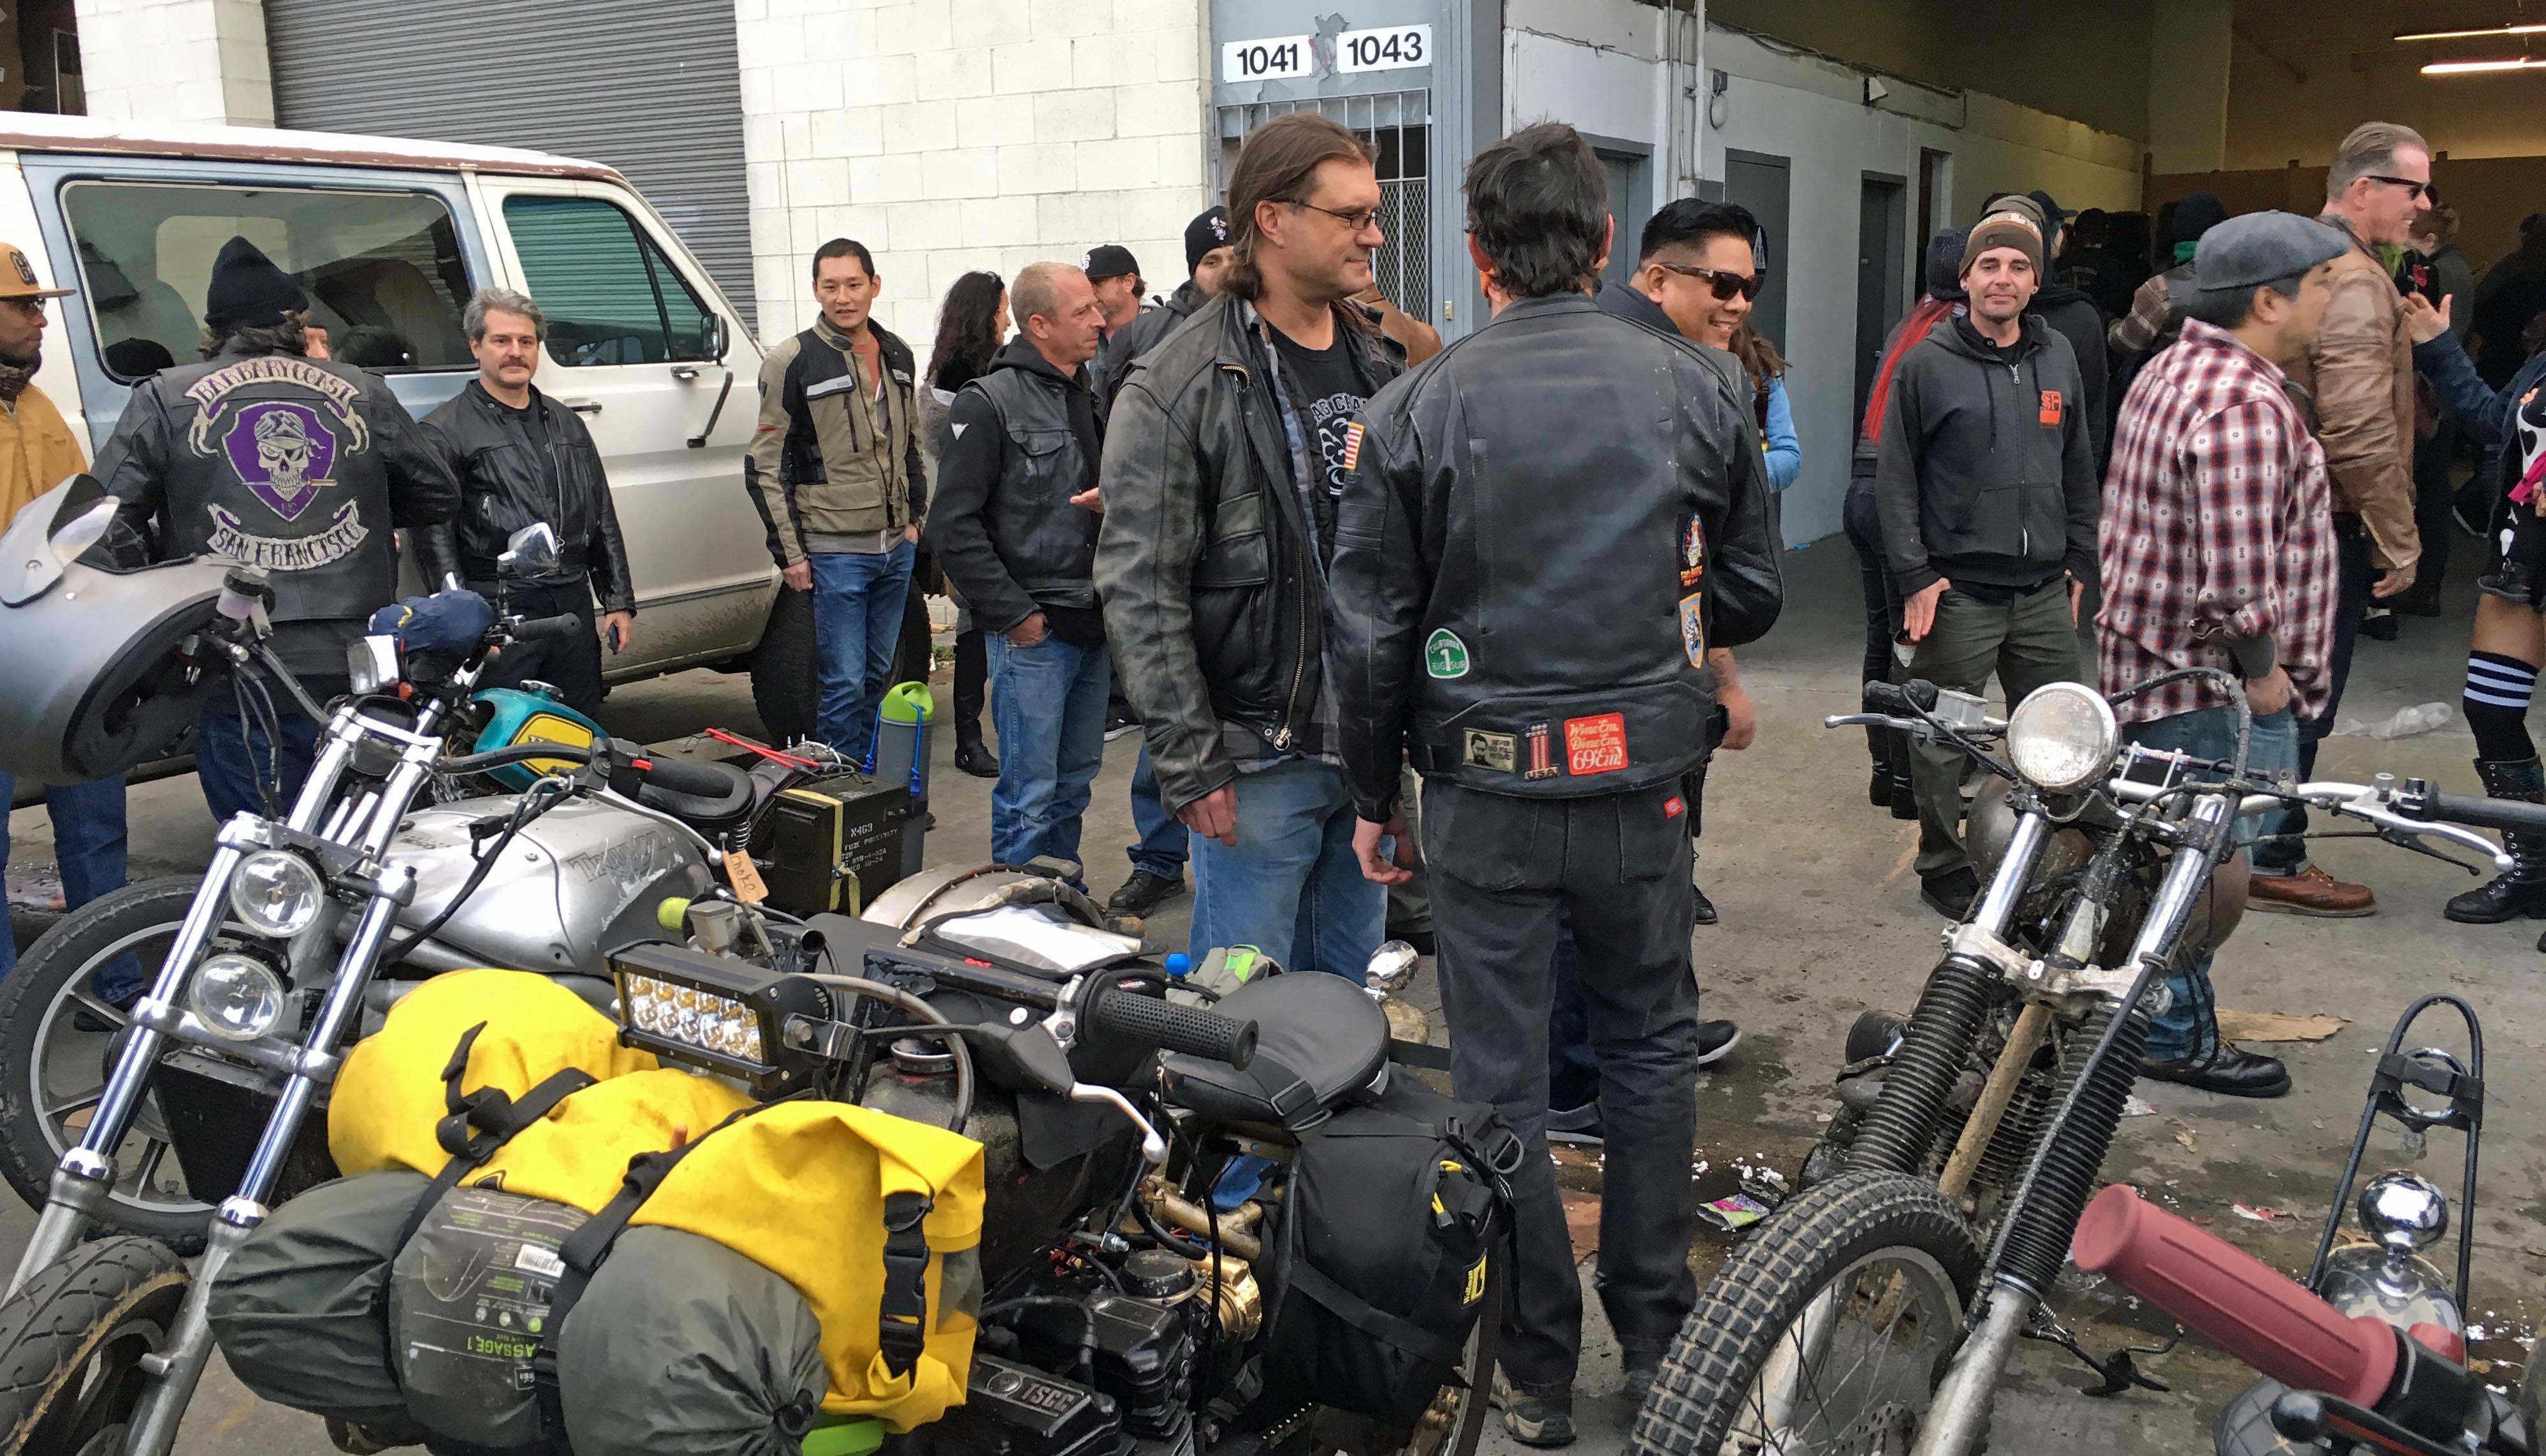 biker pack_edited-1